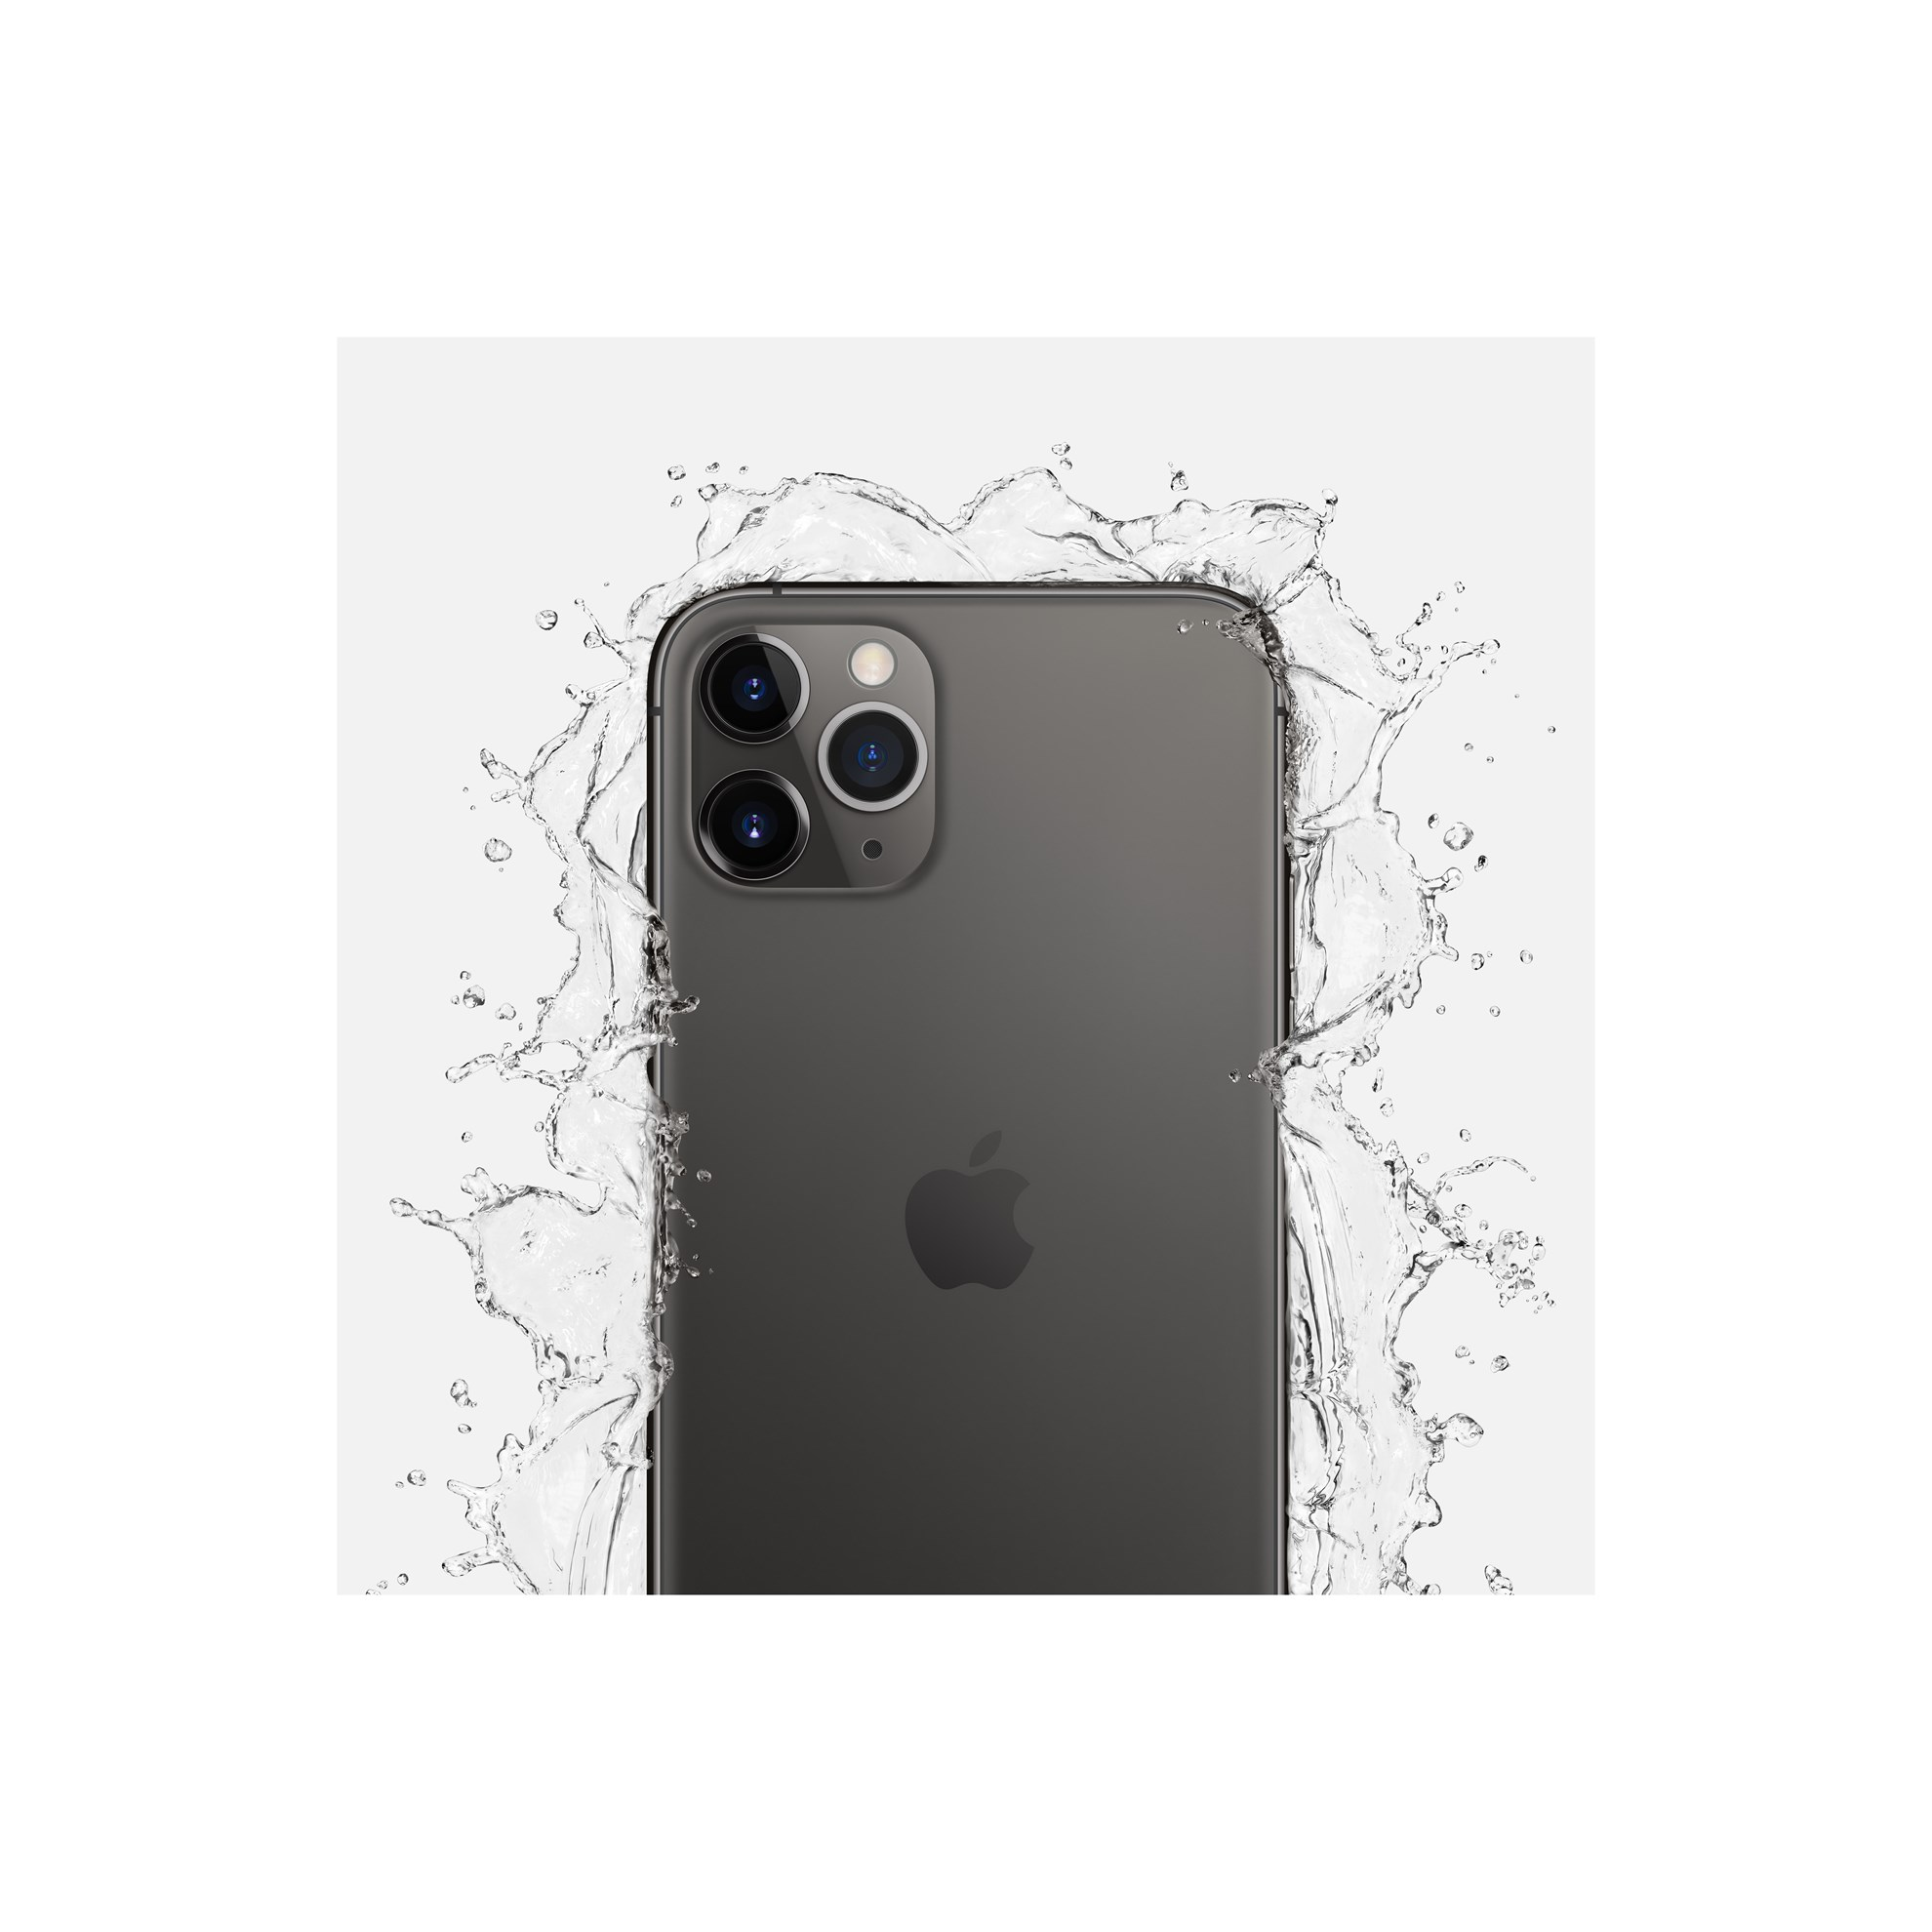 Technoworld/Տեխնոաշխարհ #7. iPhone 11 Pro․ արժի գնե՞լ, թե՝ չէ